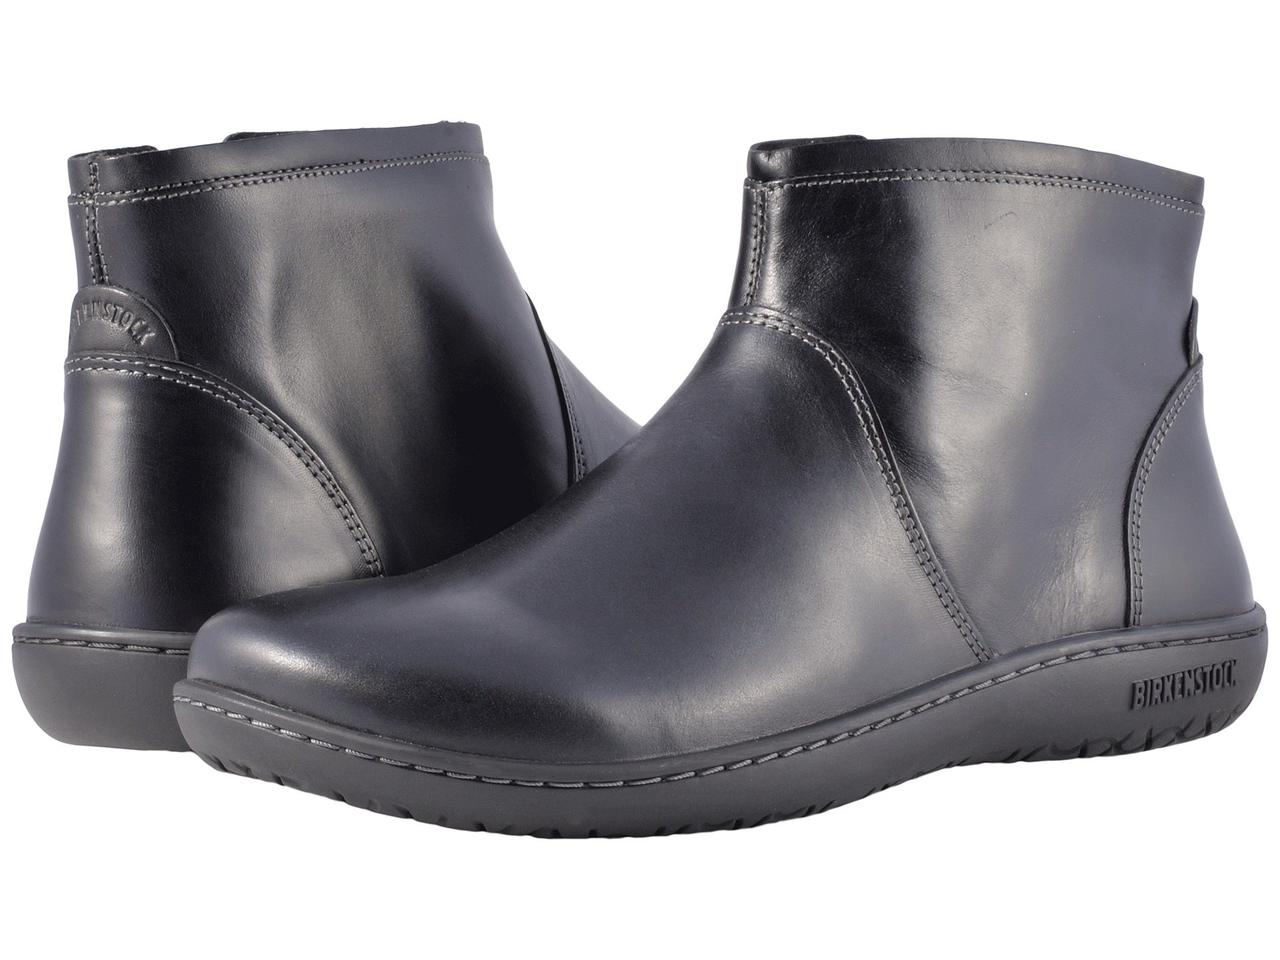 Ботинки Сапоги (Оригинал) Birkenstock Bennington Black Leather - TopUSA